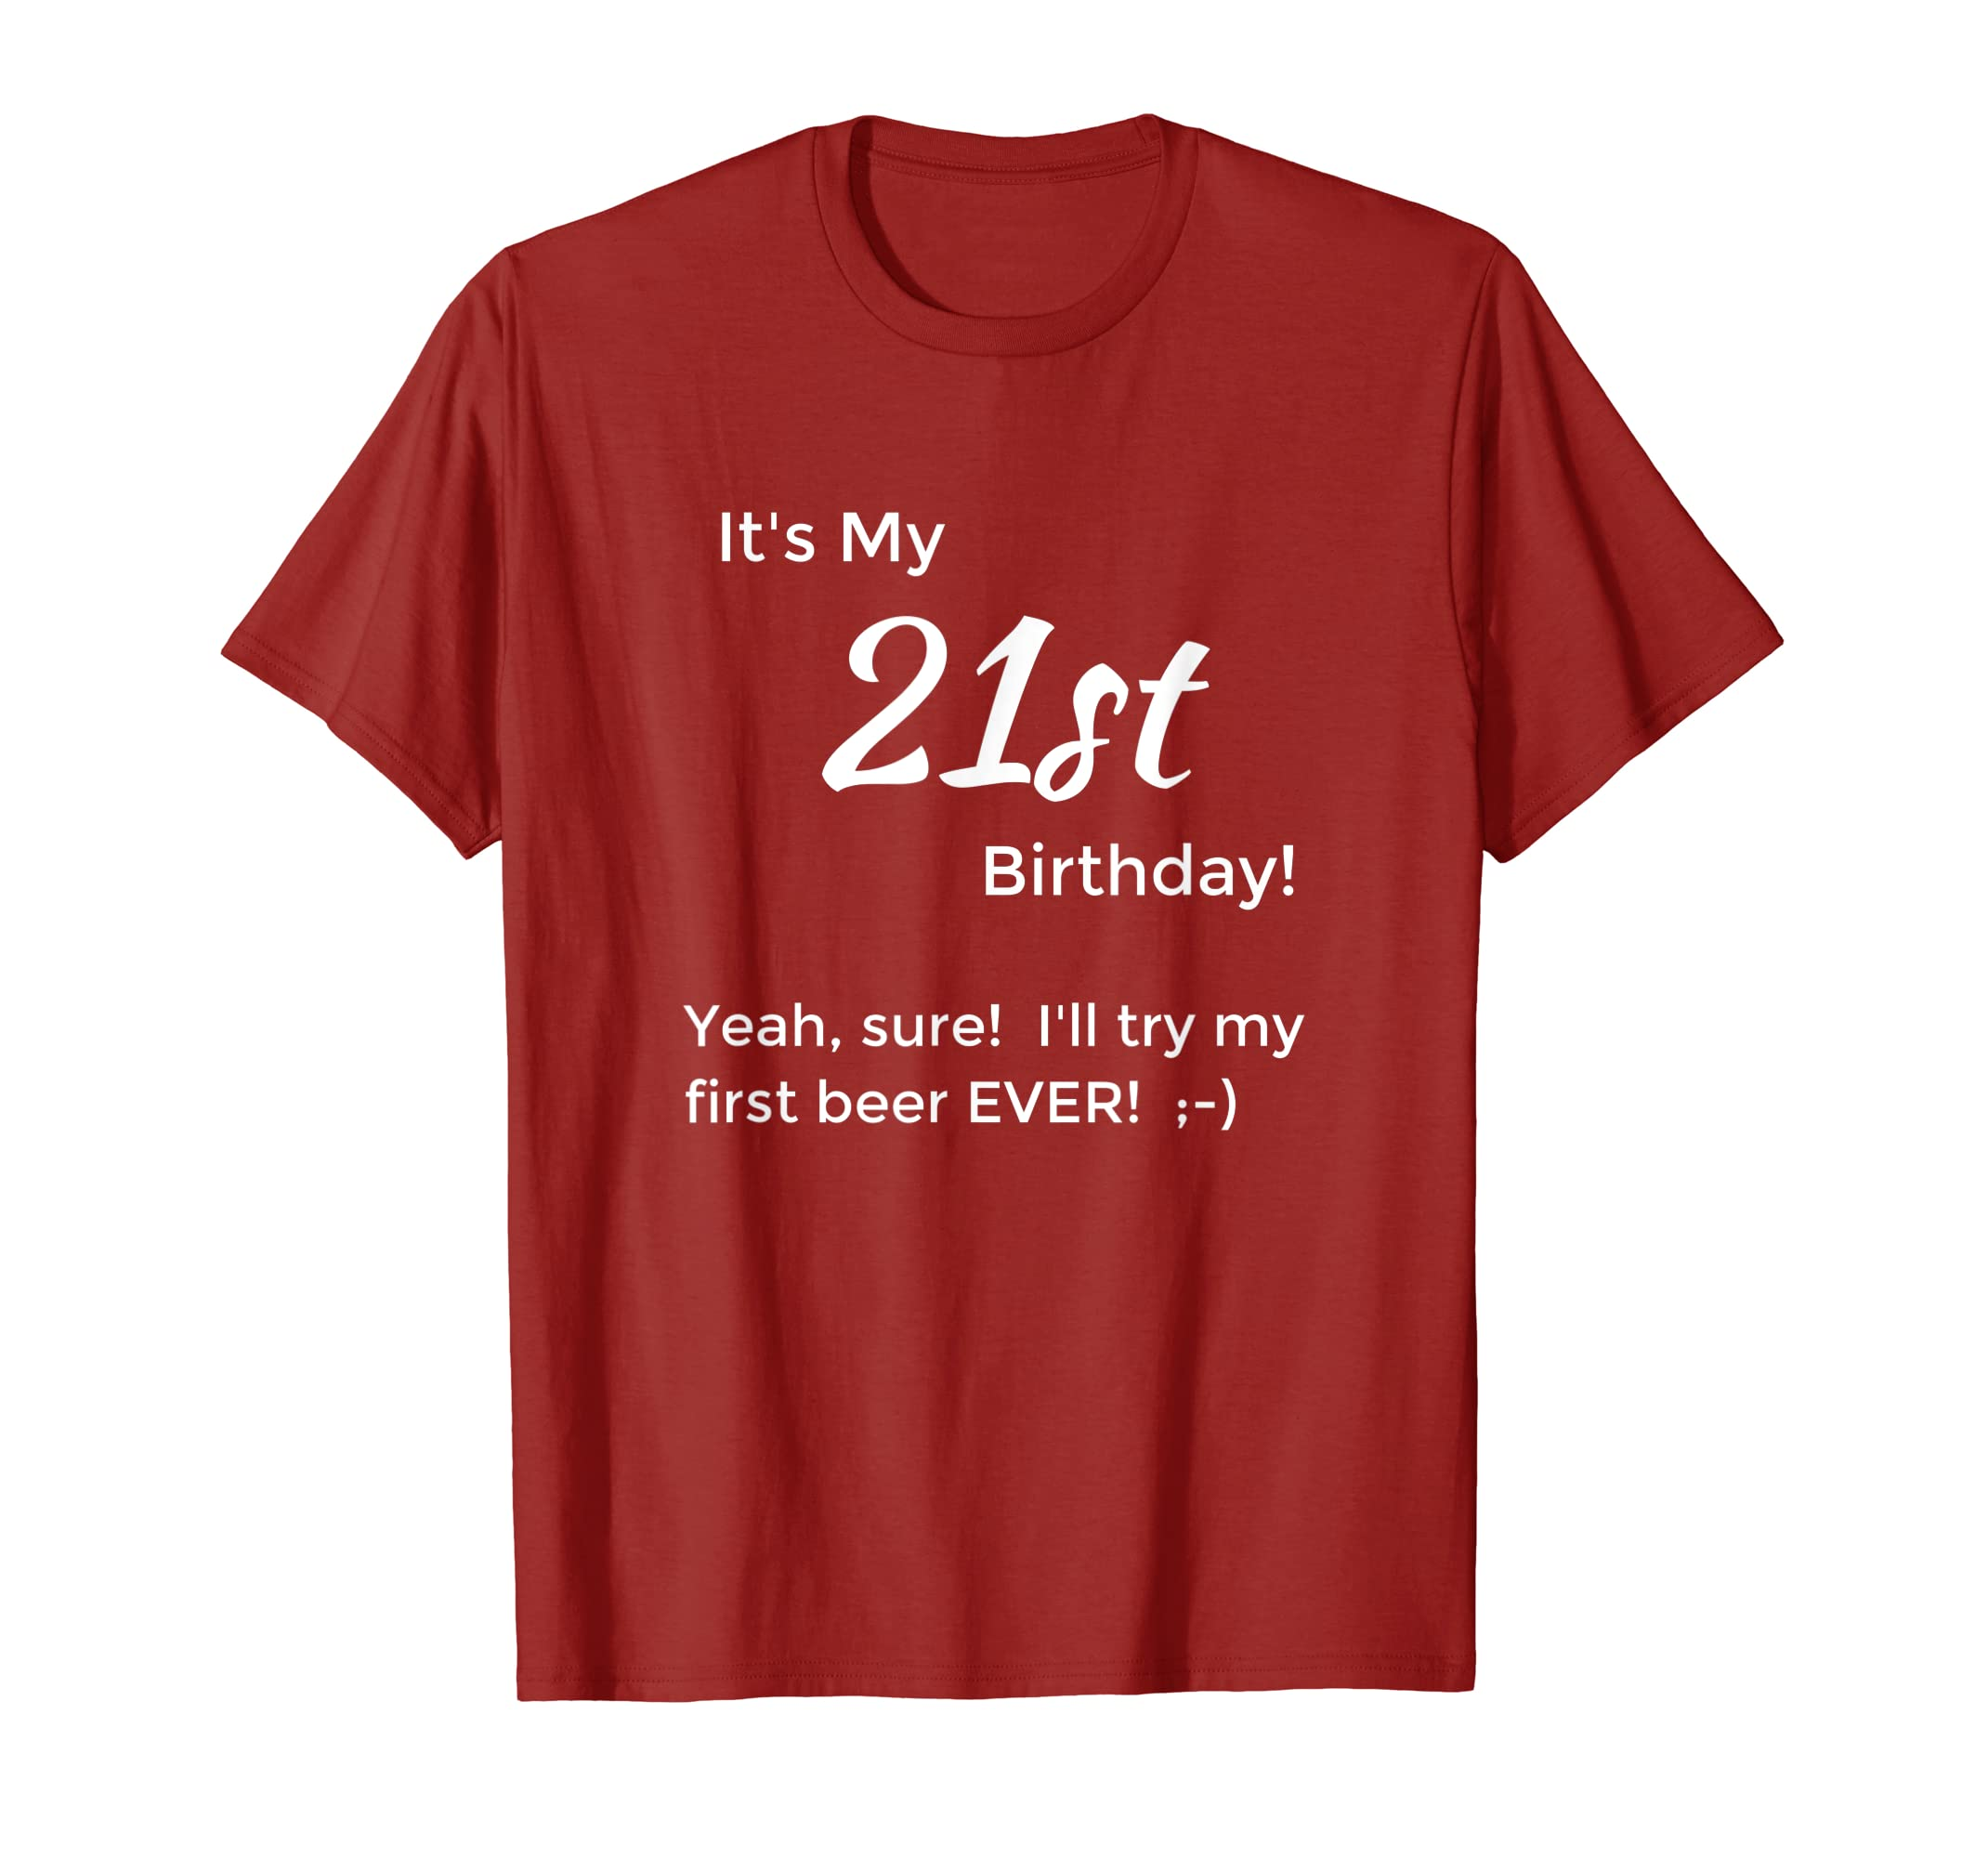 Funny 21st Birthday Shirt For Him